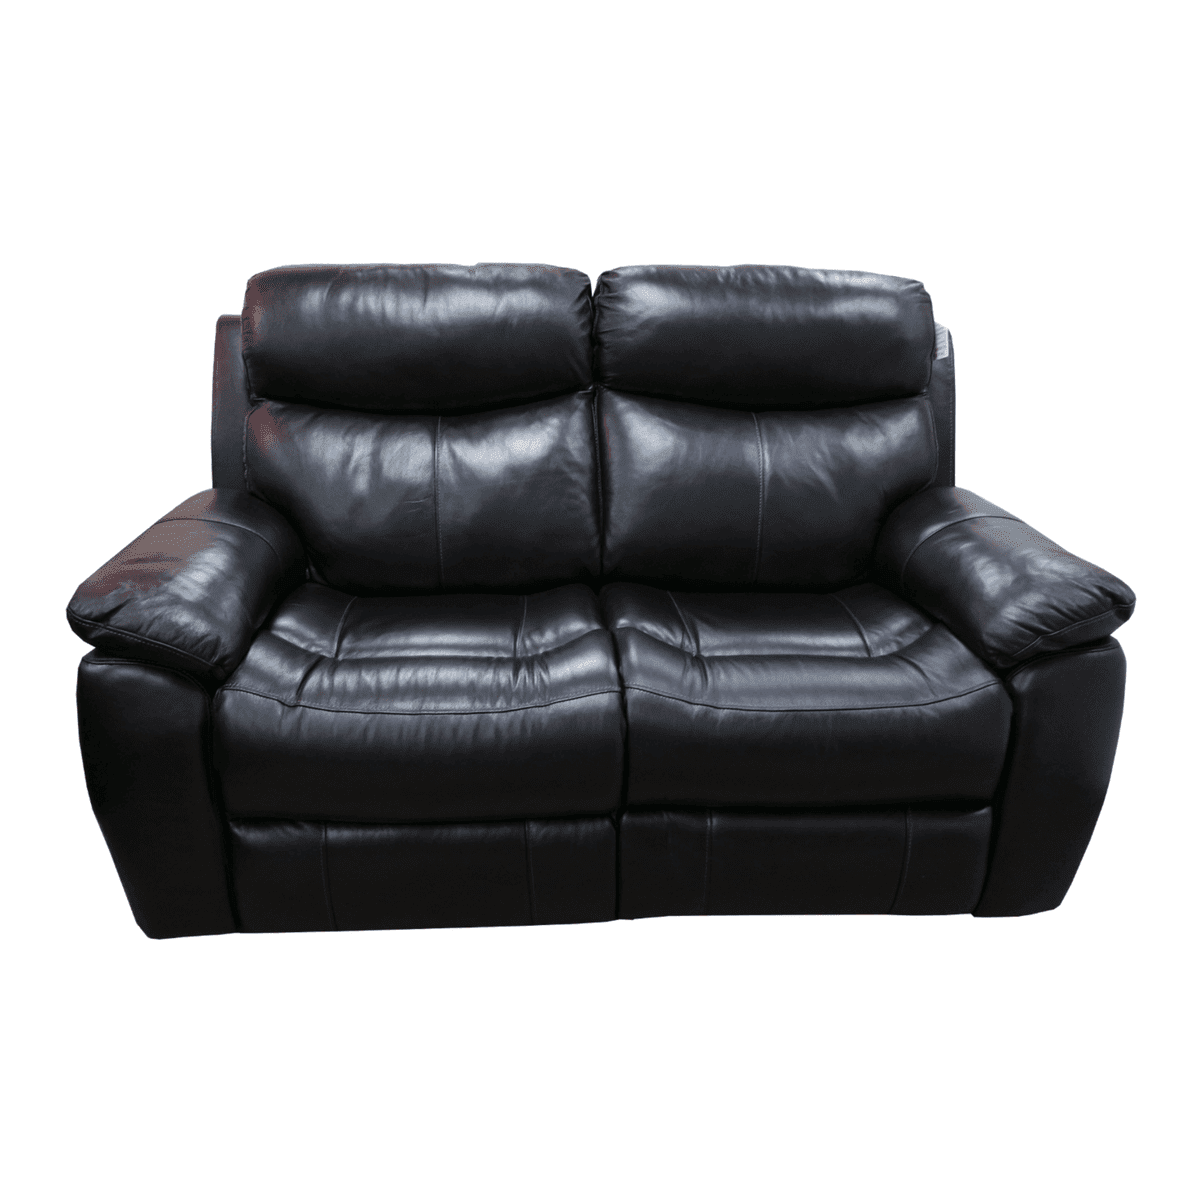 Pelican 2 Seater - Recliner - Corcorans Furniture & Carpets